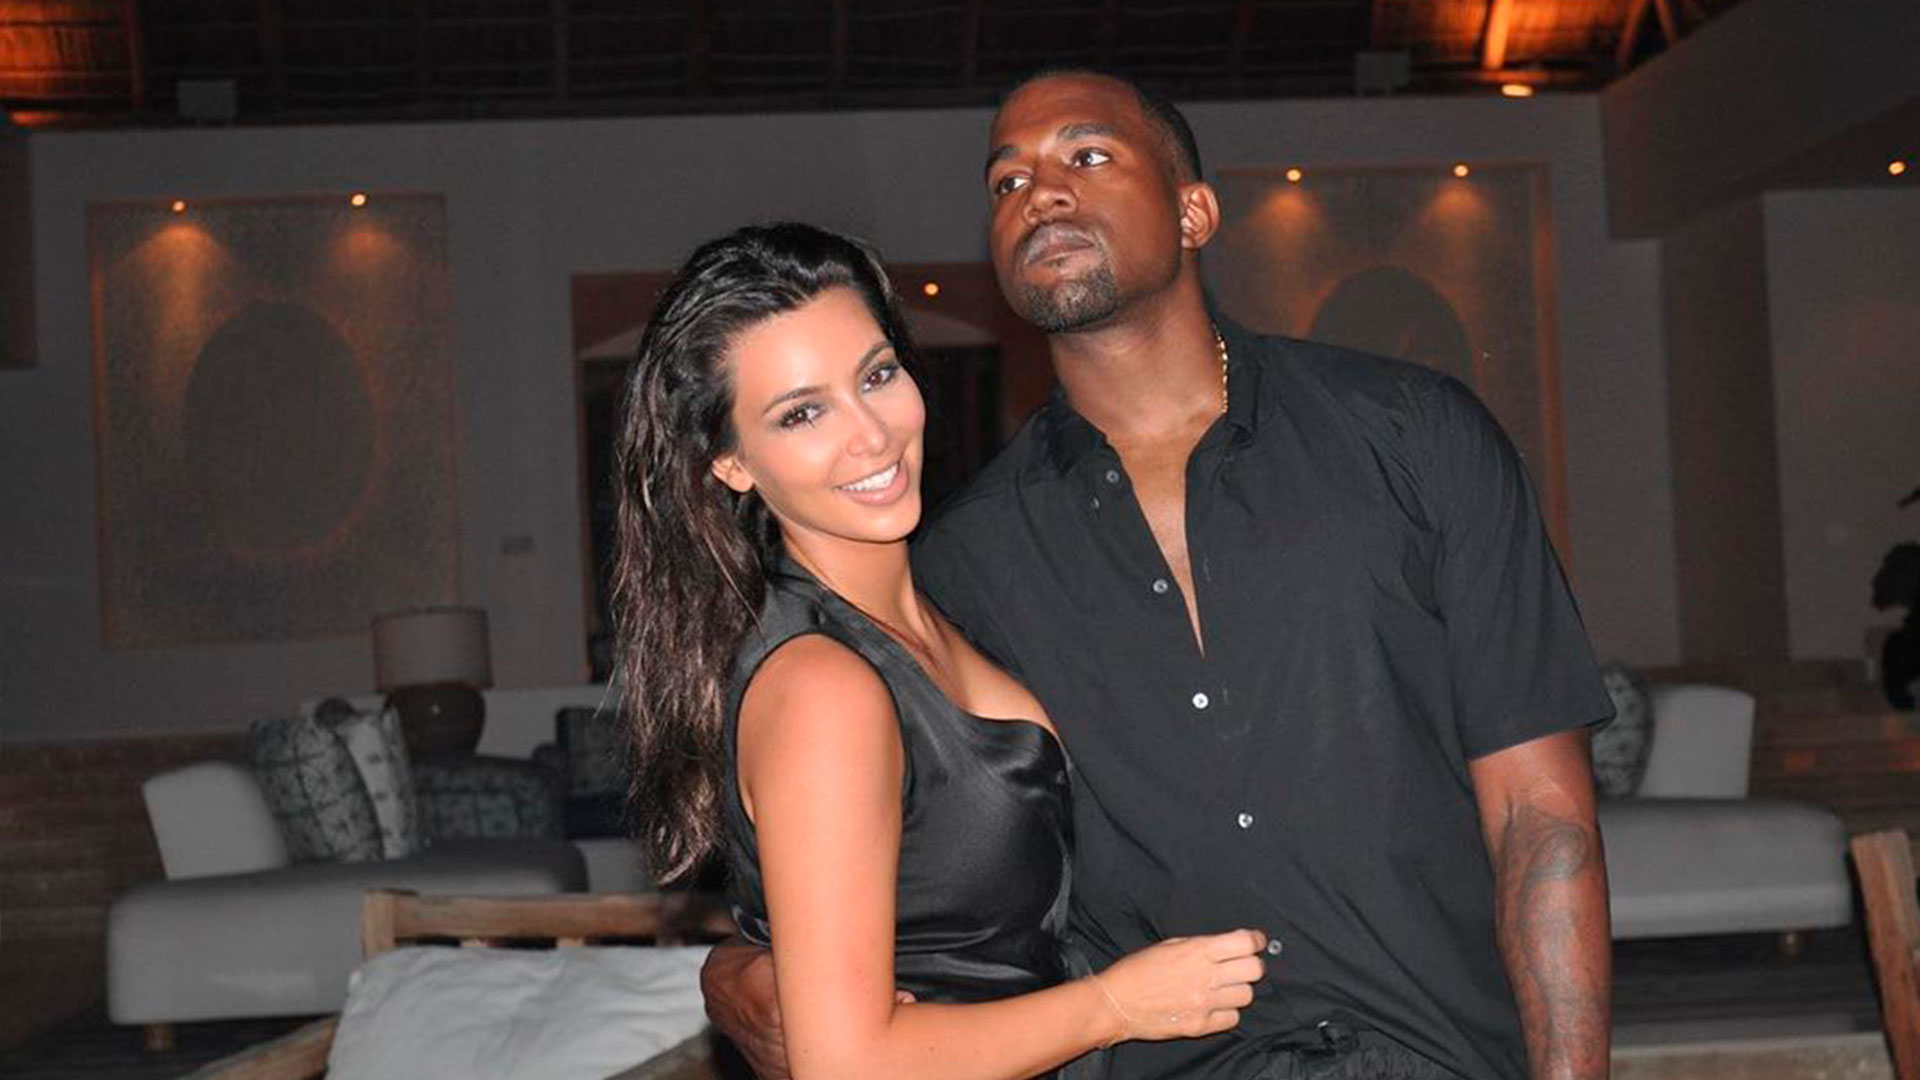 Kanye West vacilou com Kim Kardashian, mas apagou a prova